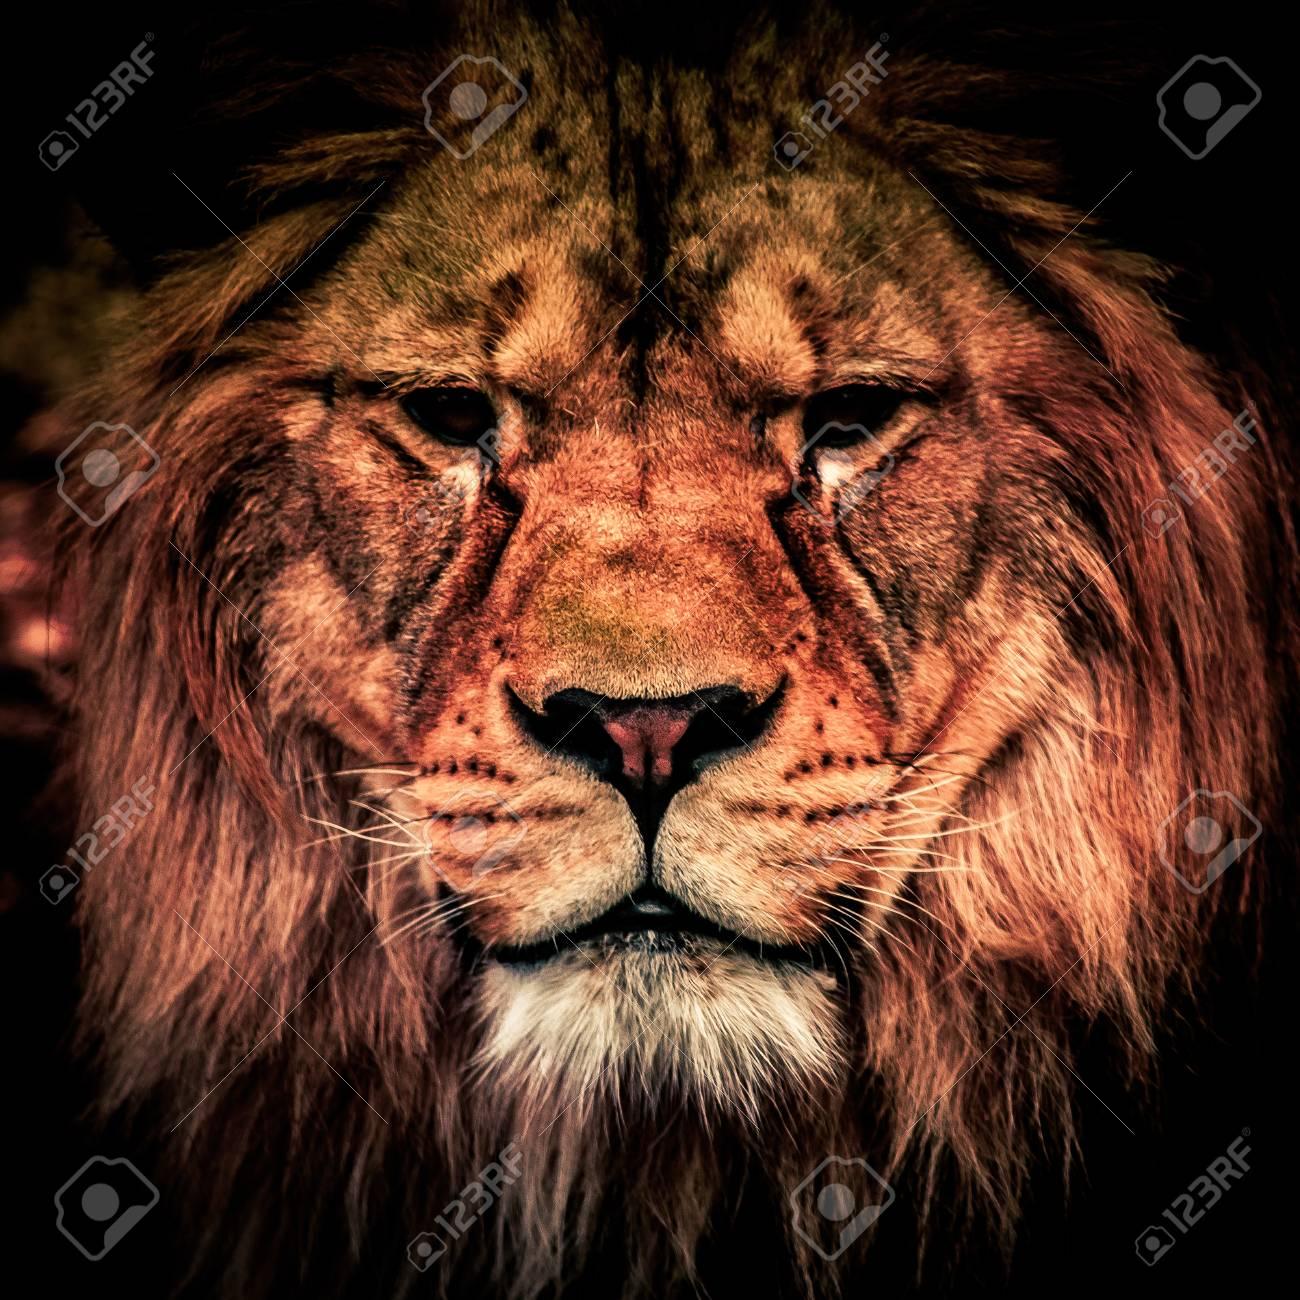 dangerous lion images  Adult Lion In The Dark. Portrait Of Big Dangerous African Animal ...